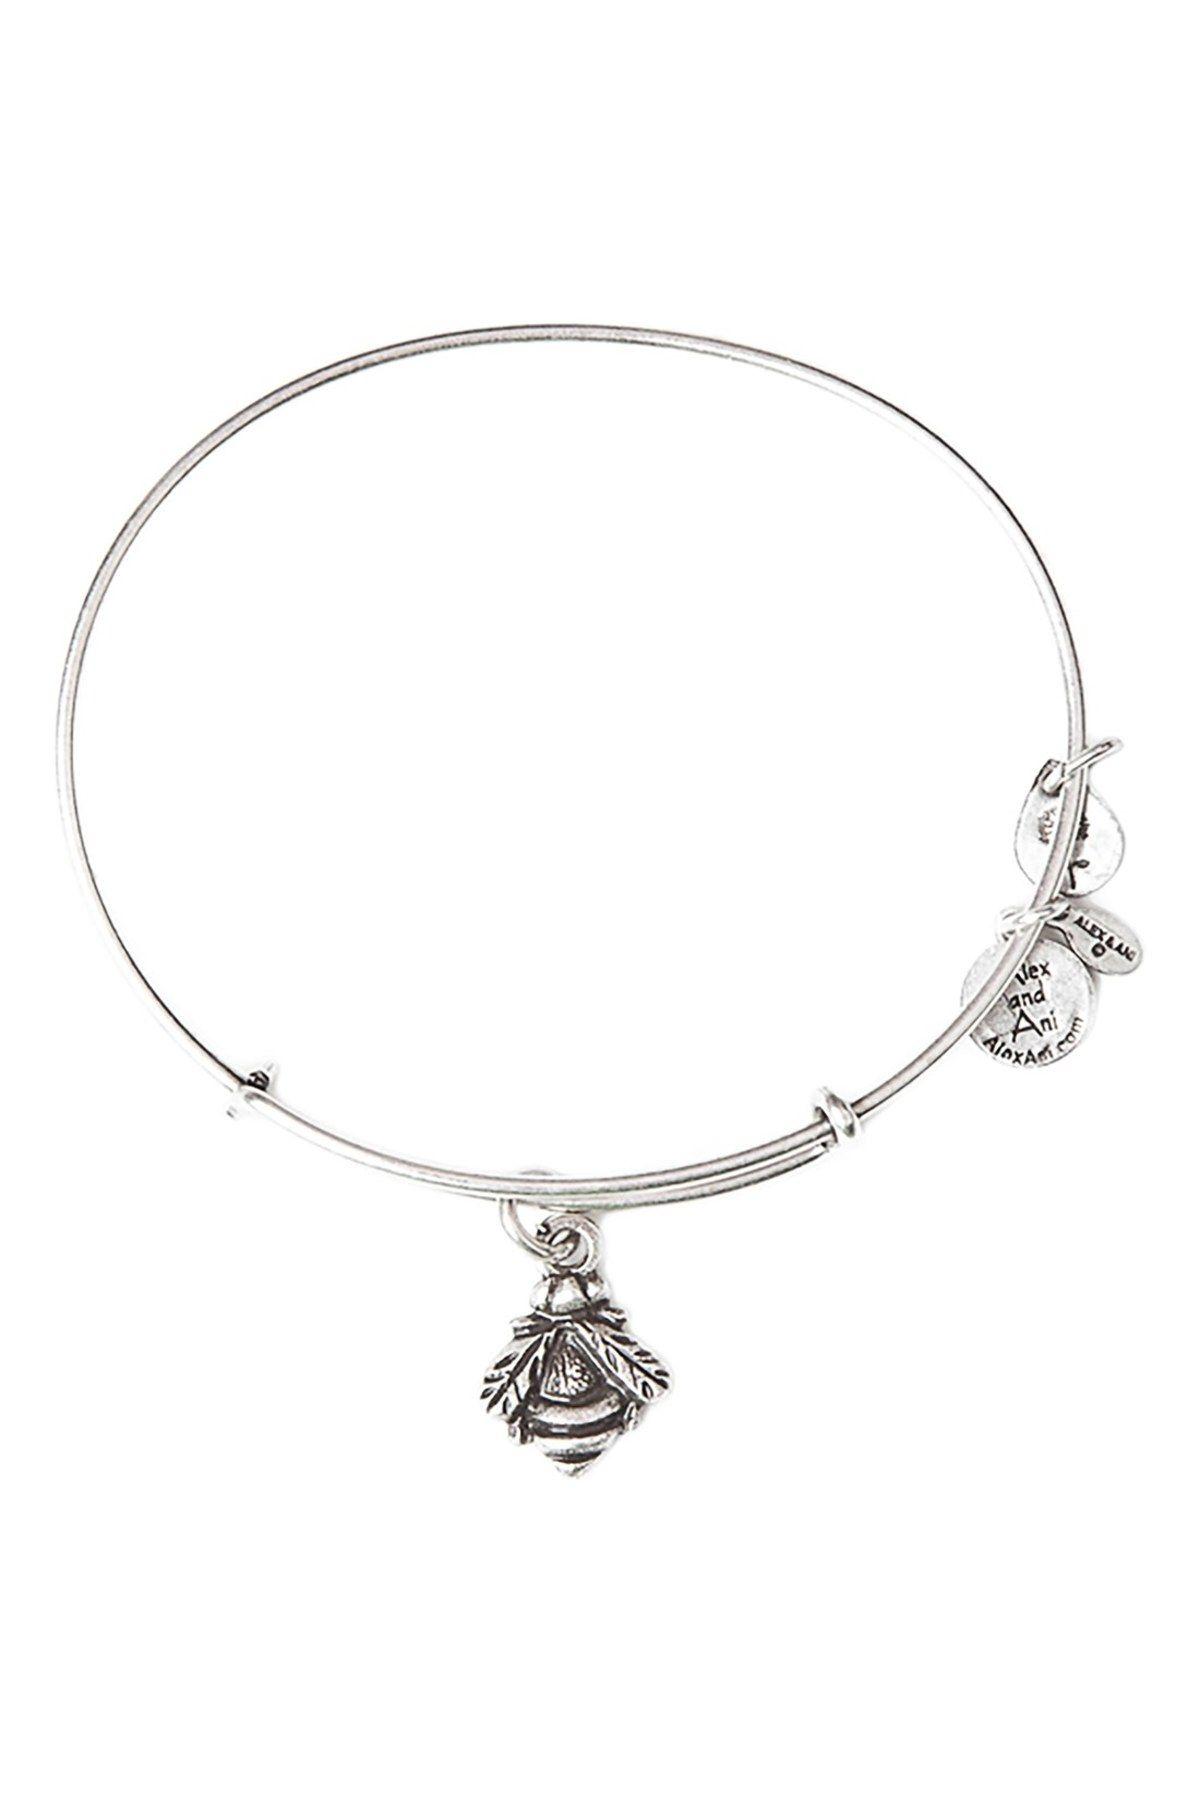 Alex and ani bumblebee expandable charm bracelet